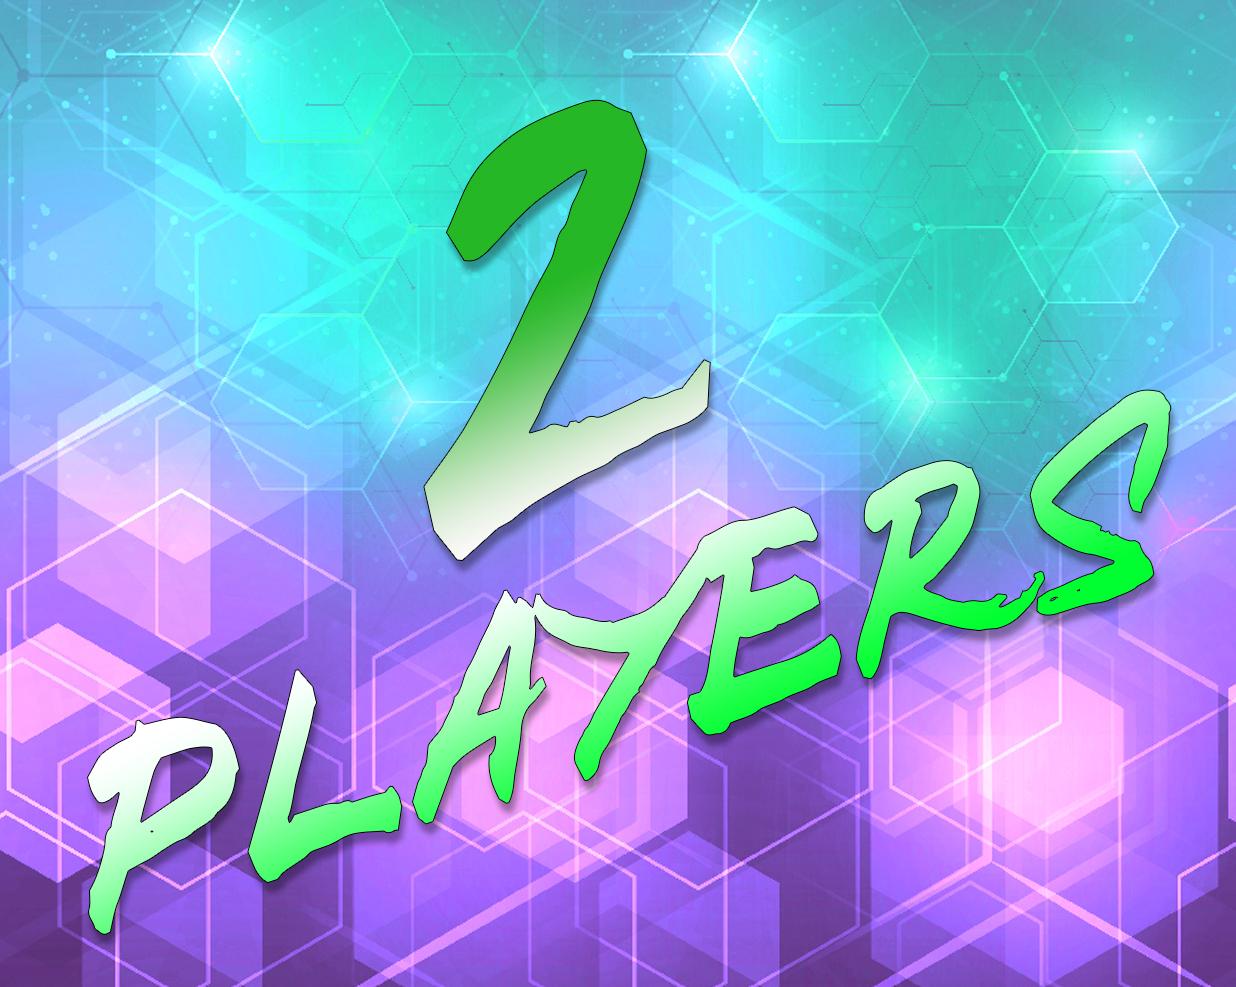 2playersfreeroam 1